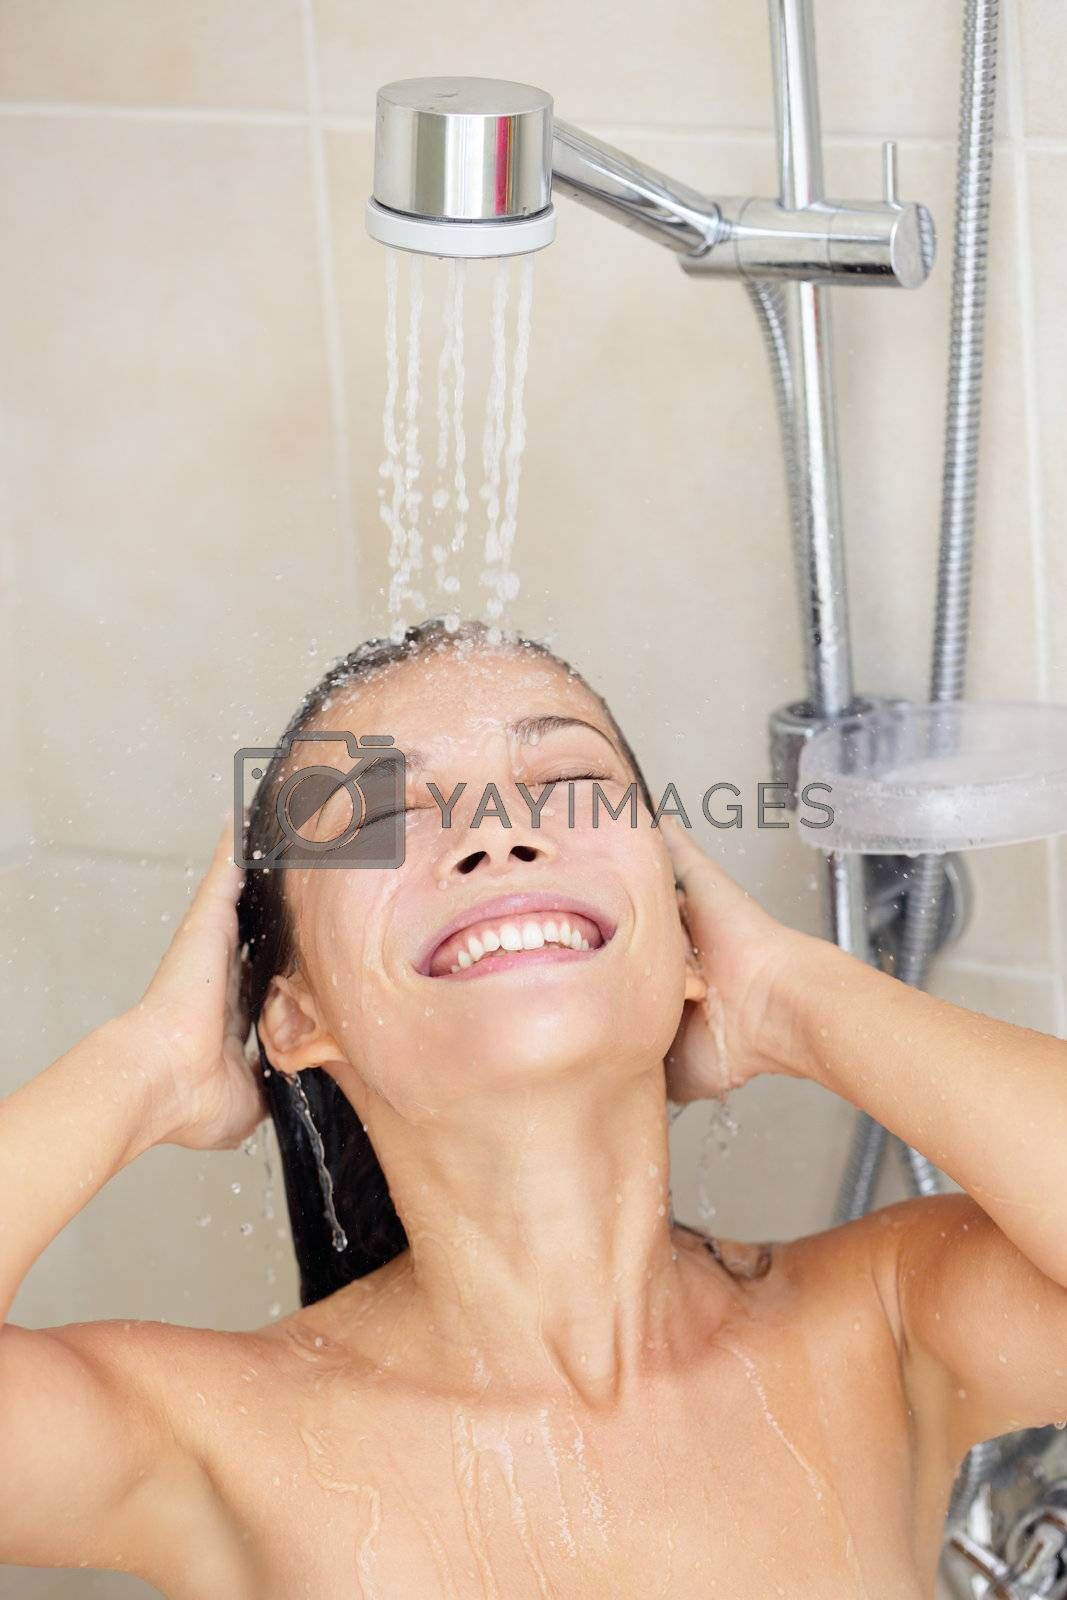 Woman washing hair enjoying showering smiling happy with face under running water. Beautiful mixed race Caucasian / Asian Chinese model in her twenties.